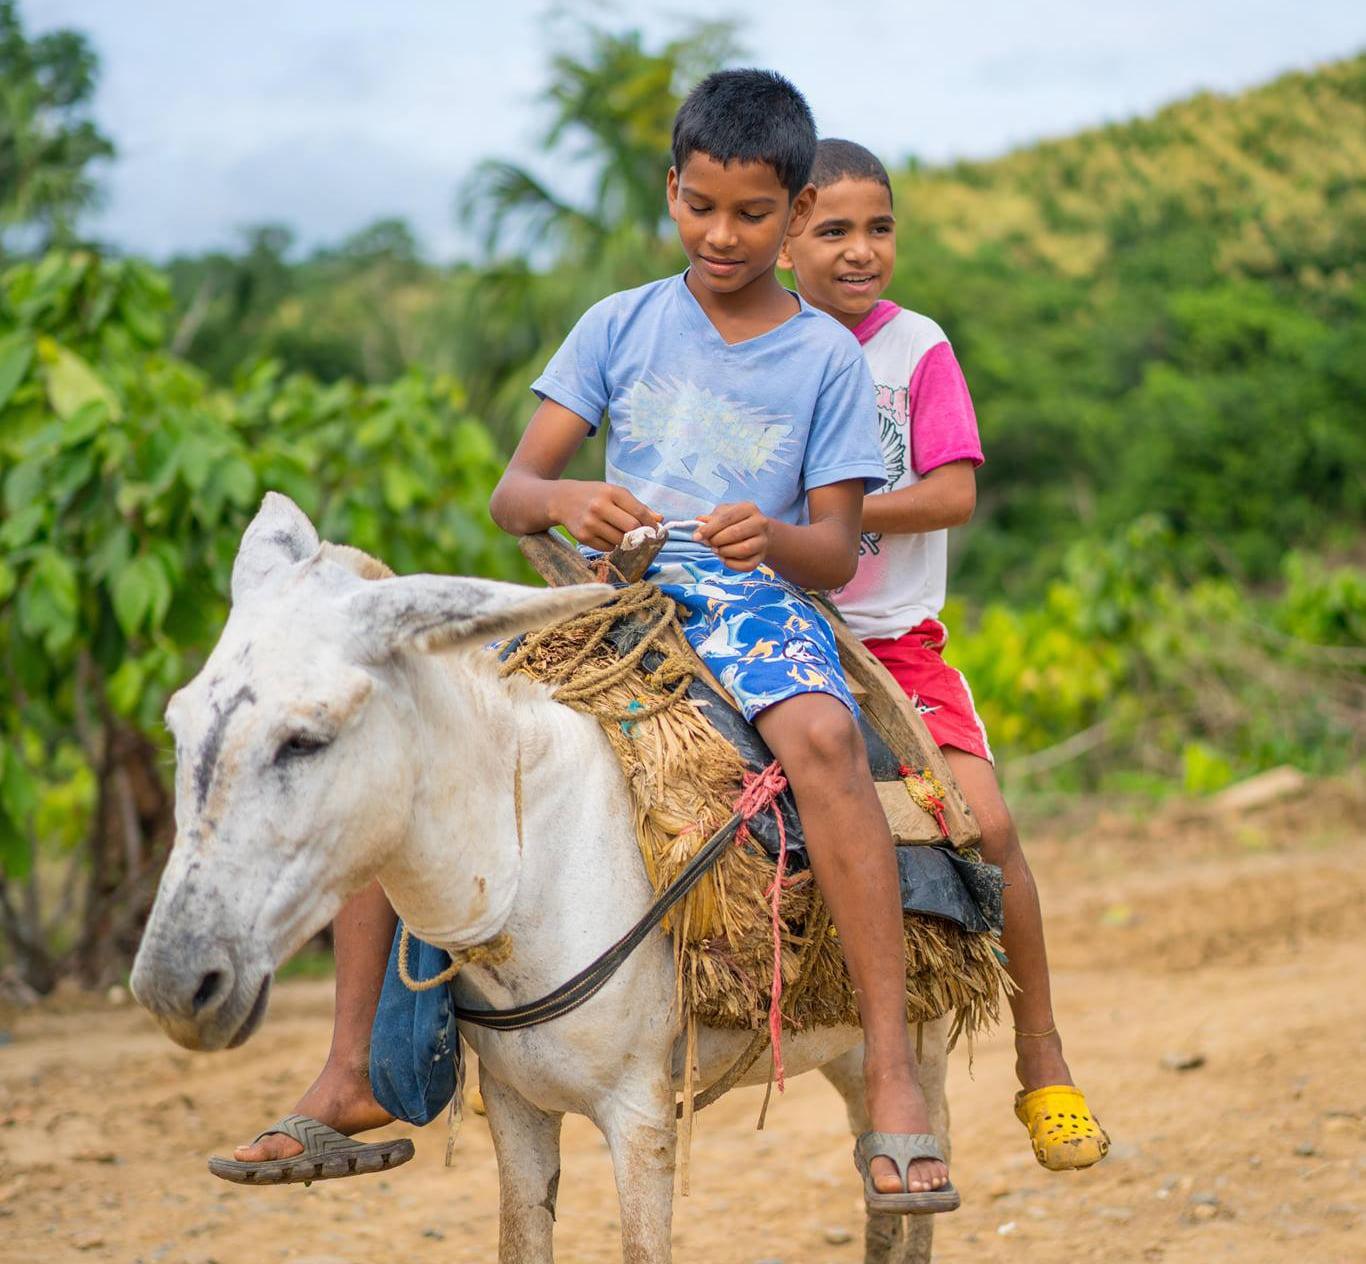 donkey ride the chocolate dream